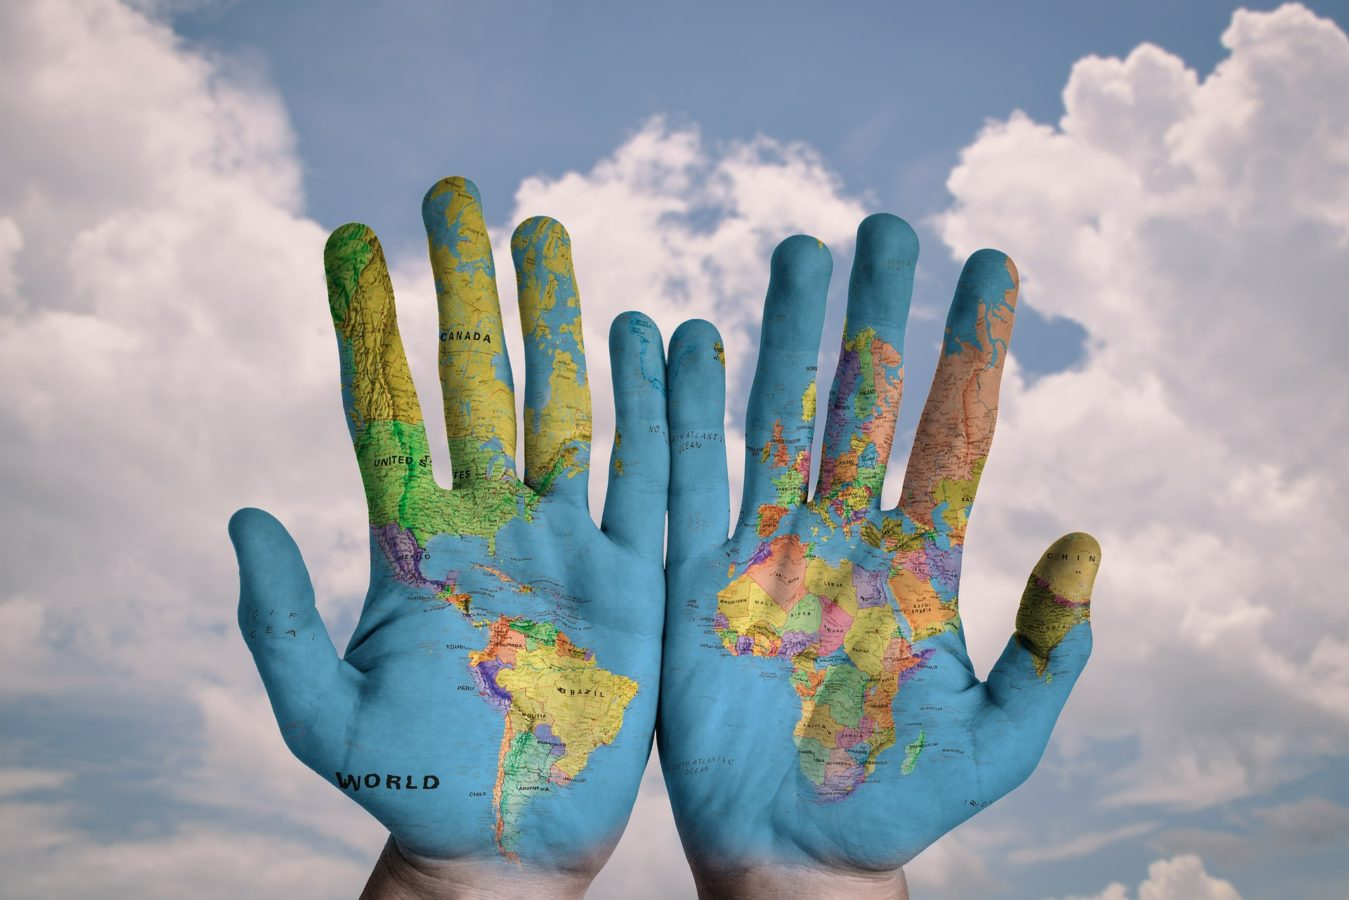 La globalisation est-ce aujourd'hui un mot vide?